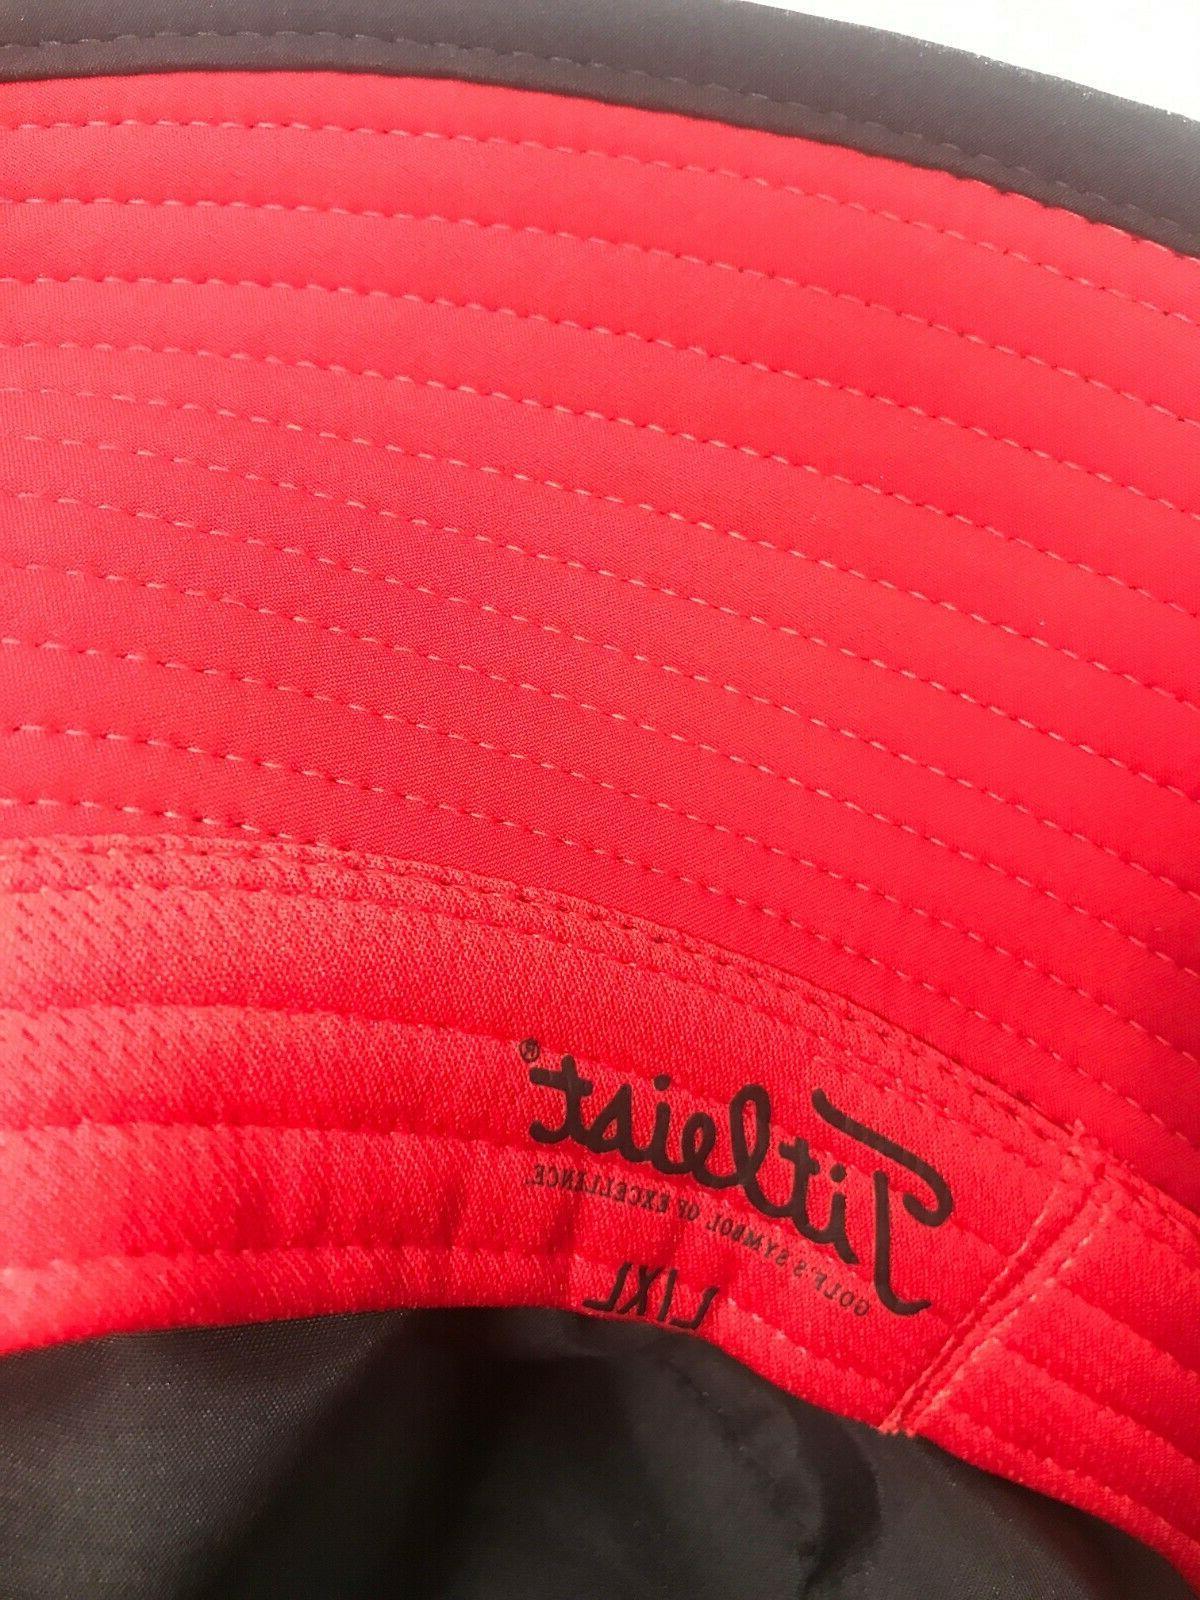 Titleist Bucket Hat - Pick Size !